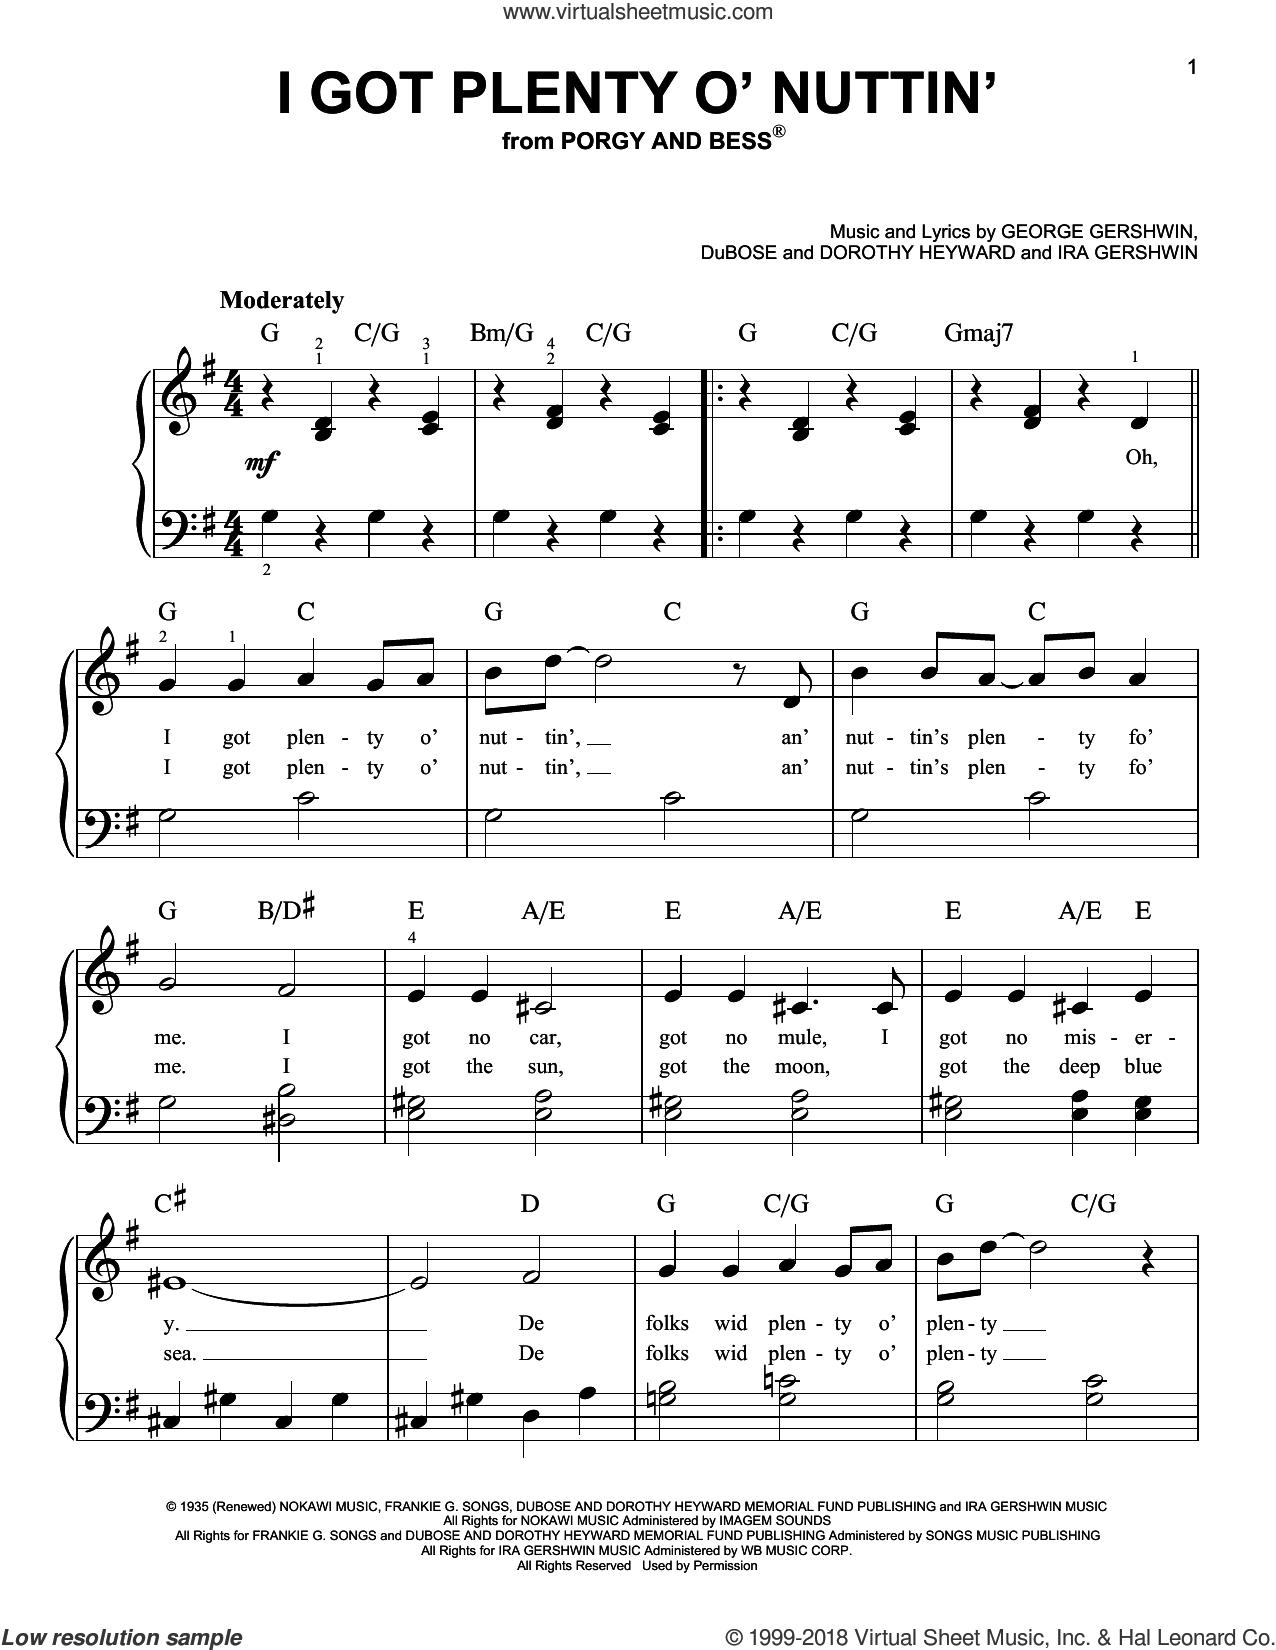 I Got Plenty O' Nuttin' (from Porgy and Bess) sheet music for piano solo by George Gershwin, Dorothy Heyward, DuBose Heyward and Ira Gershwin, beginner skill level